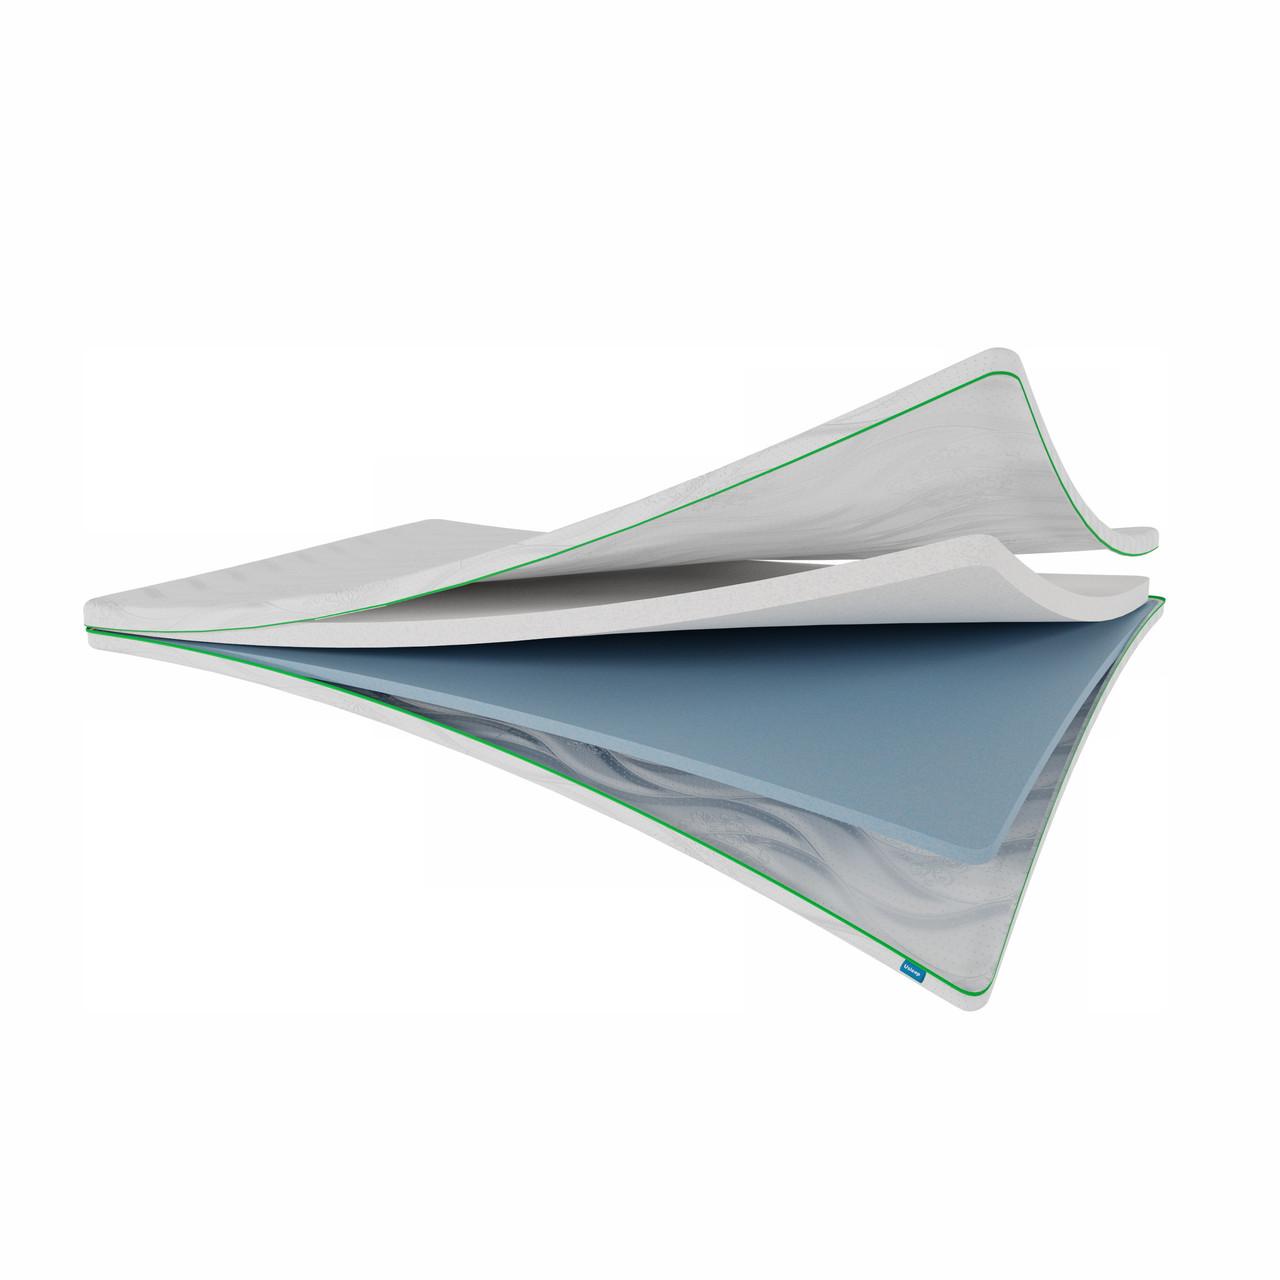 Тонкий матрац топпер-футон SleepRoll Green Usleep 150х190